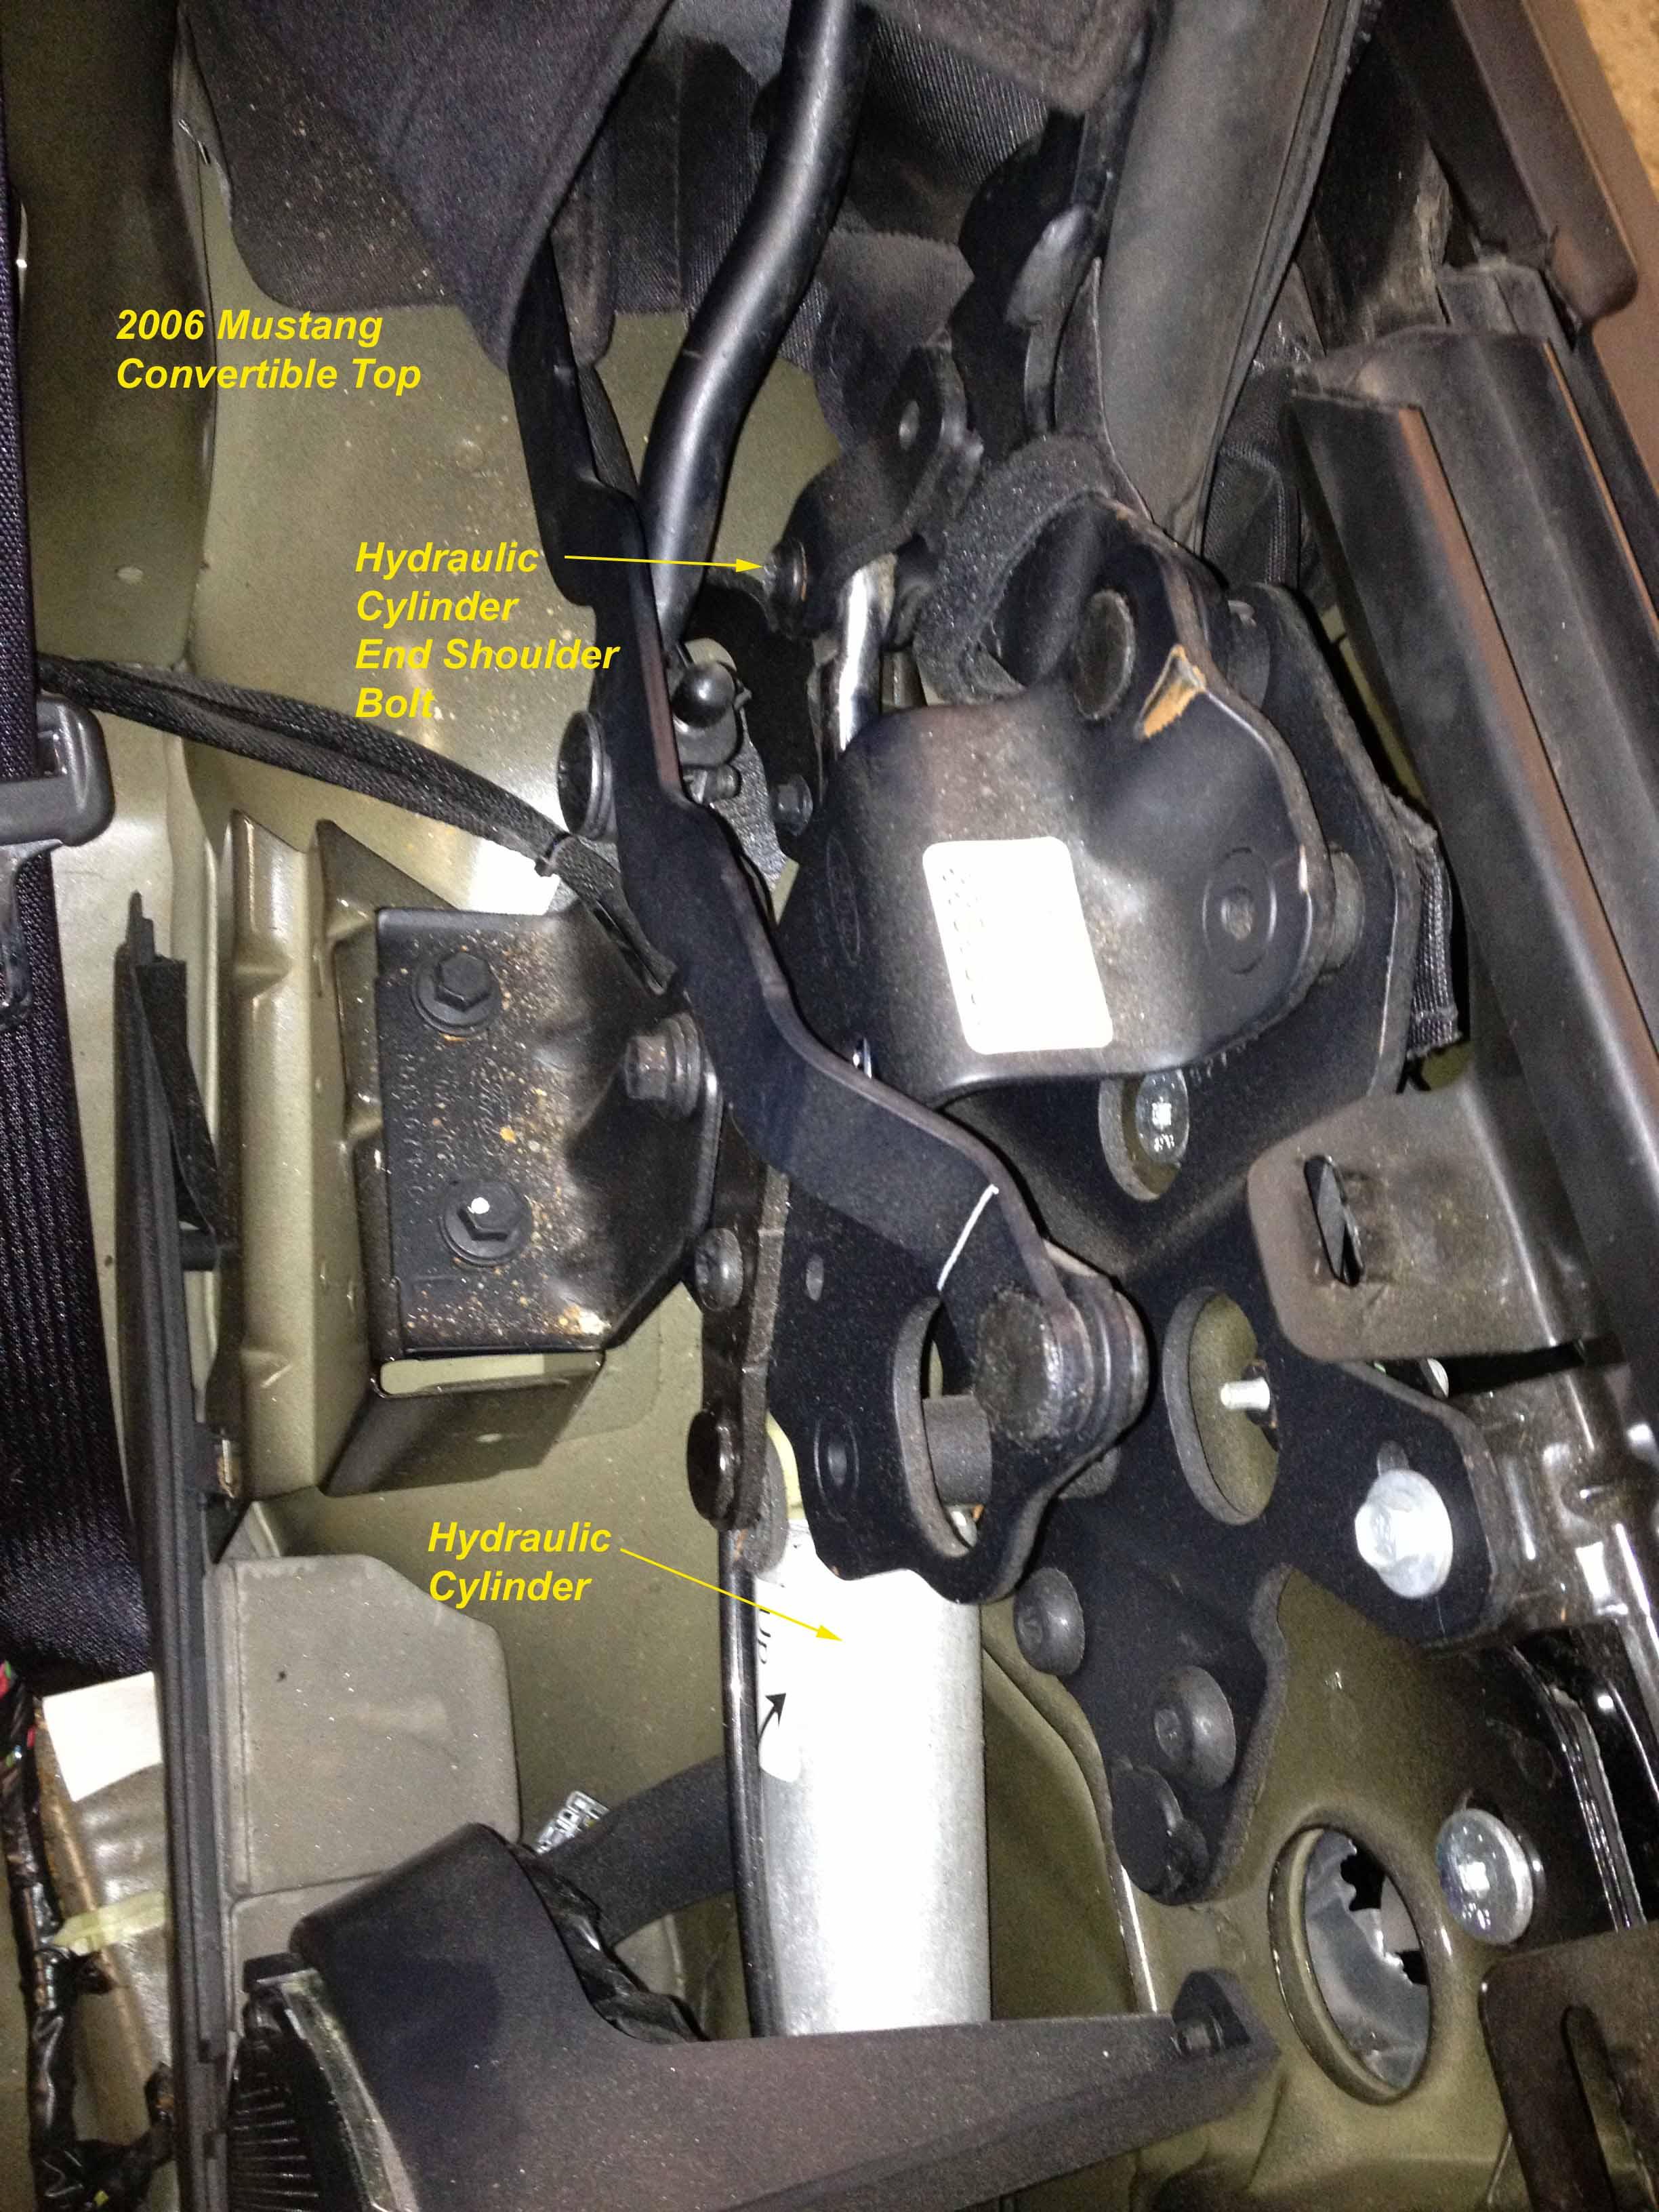 Click image for larger version  Name:Hydraulic Cylinder Shoulder Bolt.jpg Views:317 Size:475.4 KB ID:79498